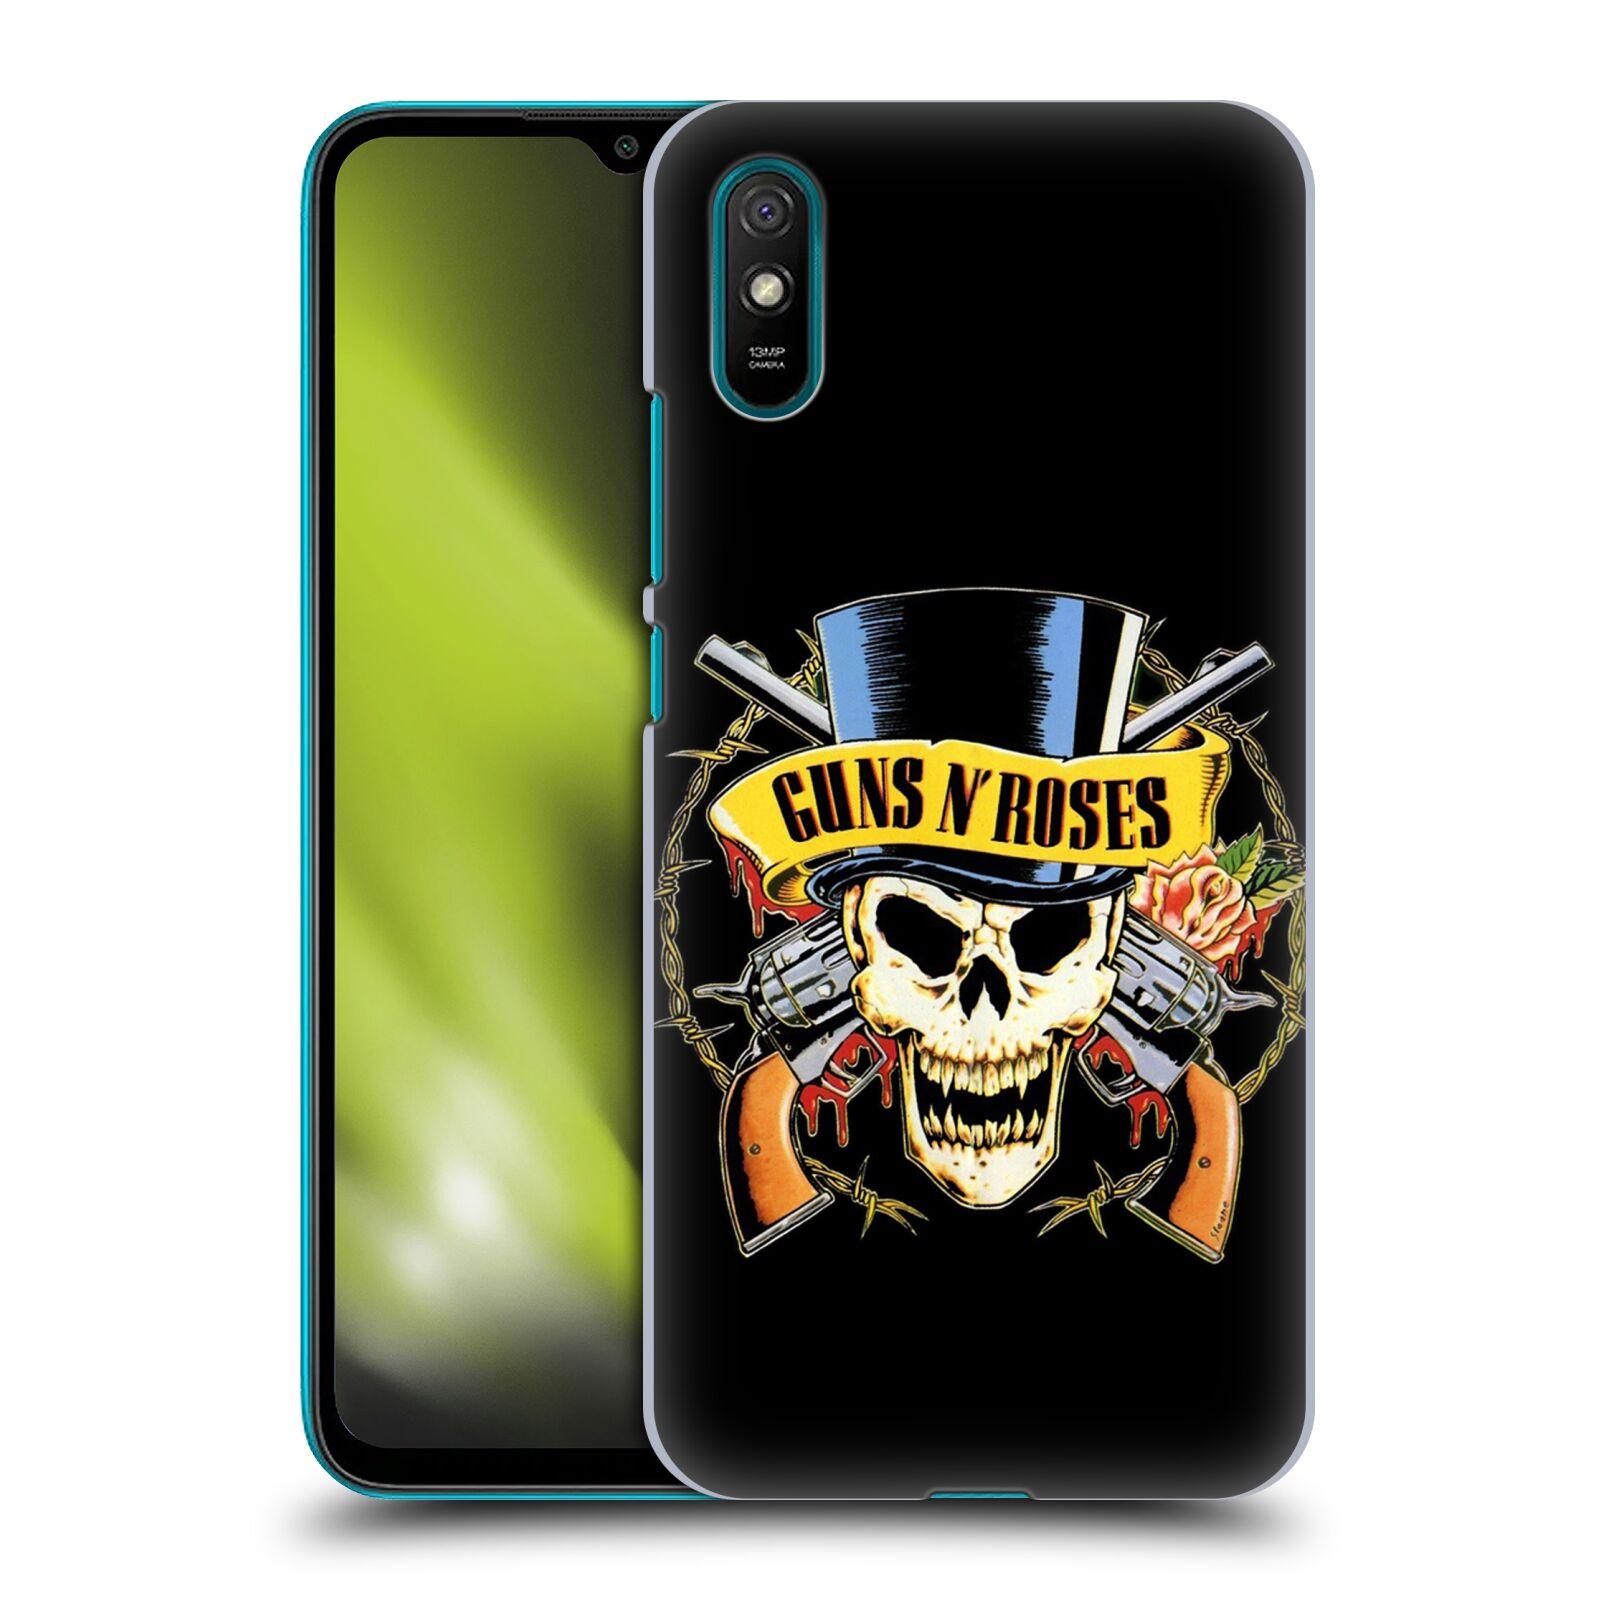 Plastové pouzdro na mobil Xiaomi Redmi 9A / Xiaomi Redmi 9AT - Head Case - Guns N' Roses - Lebka